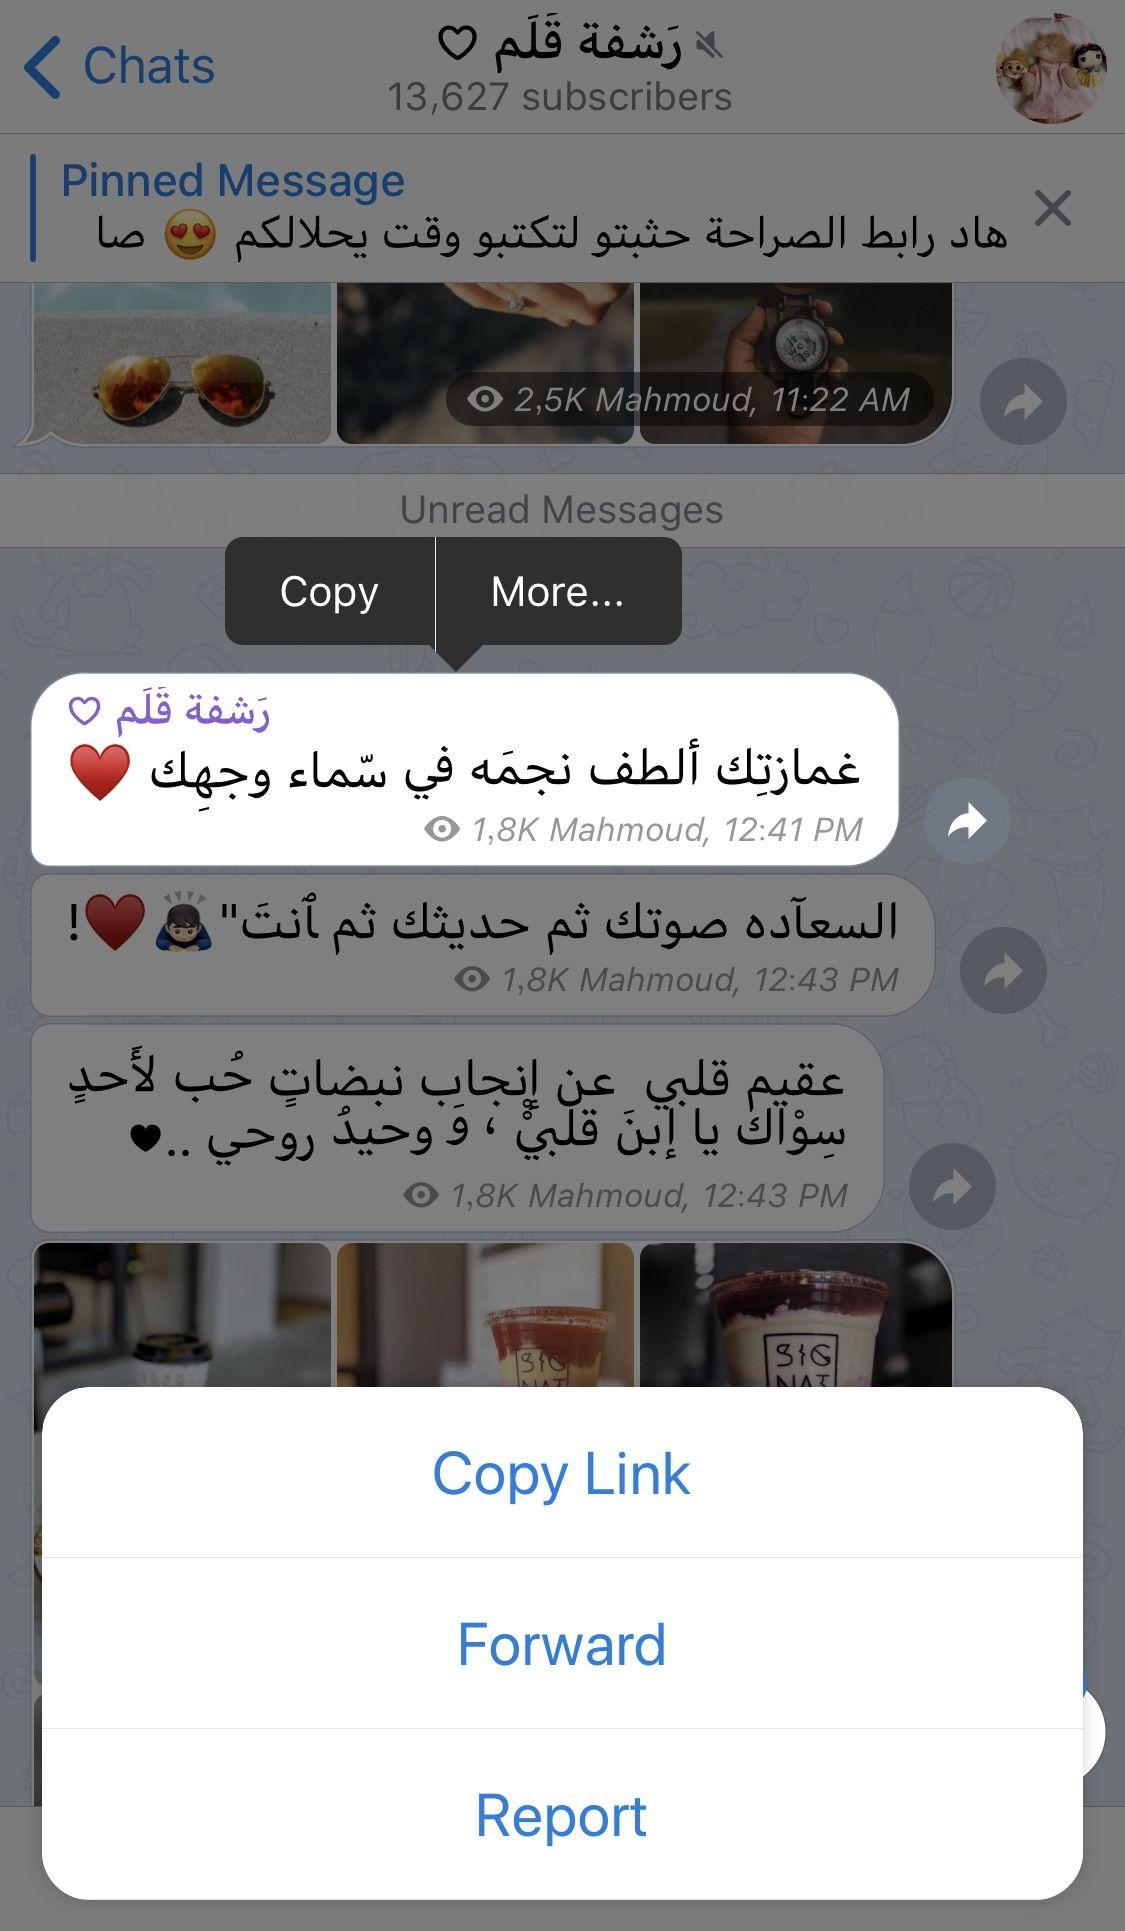 يا الله شو اني احبها الله يخليها لي Intuition Quotes Funny Arabic Quotes Islamic Love Quotes